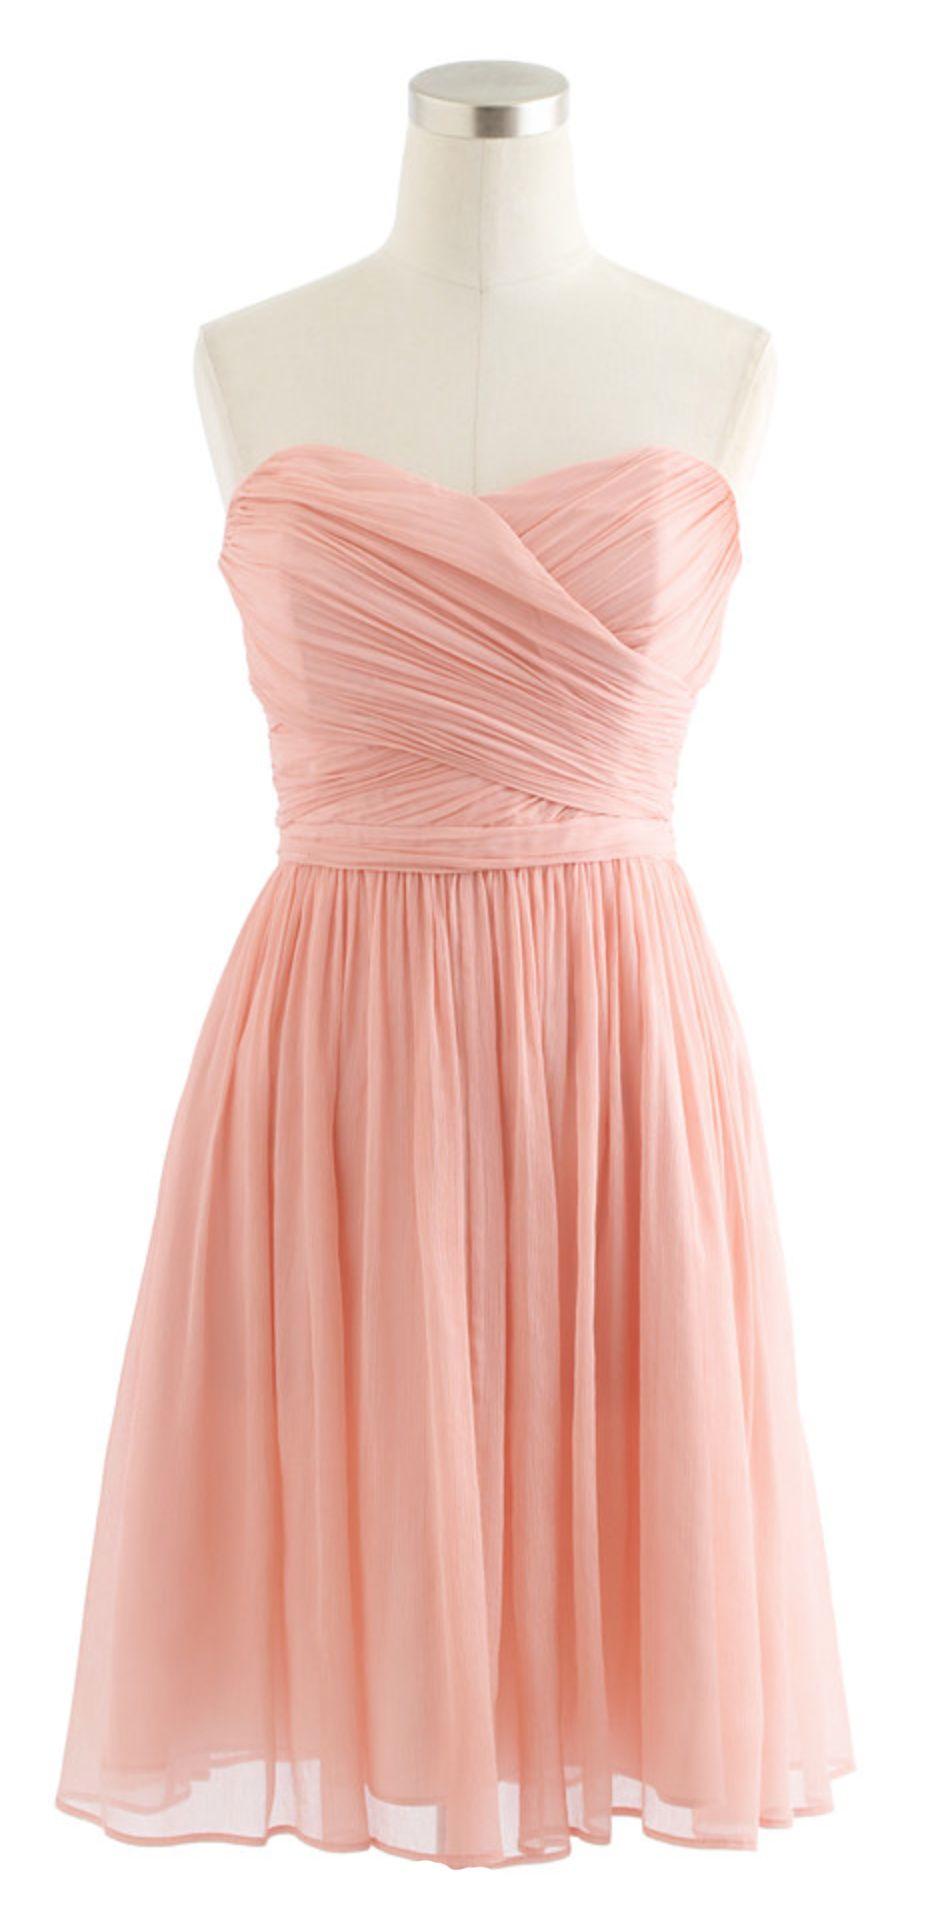 Blush sweetheart dress | Style | Pinterest | Damitas de honor, Damas ...